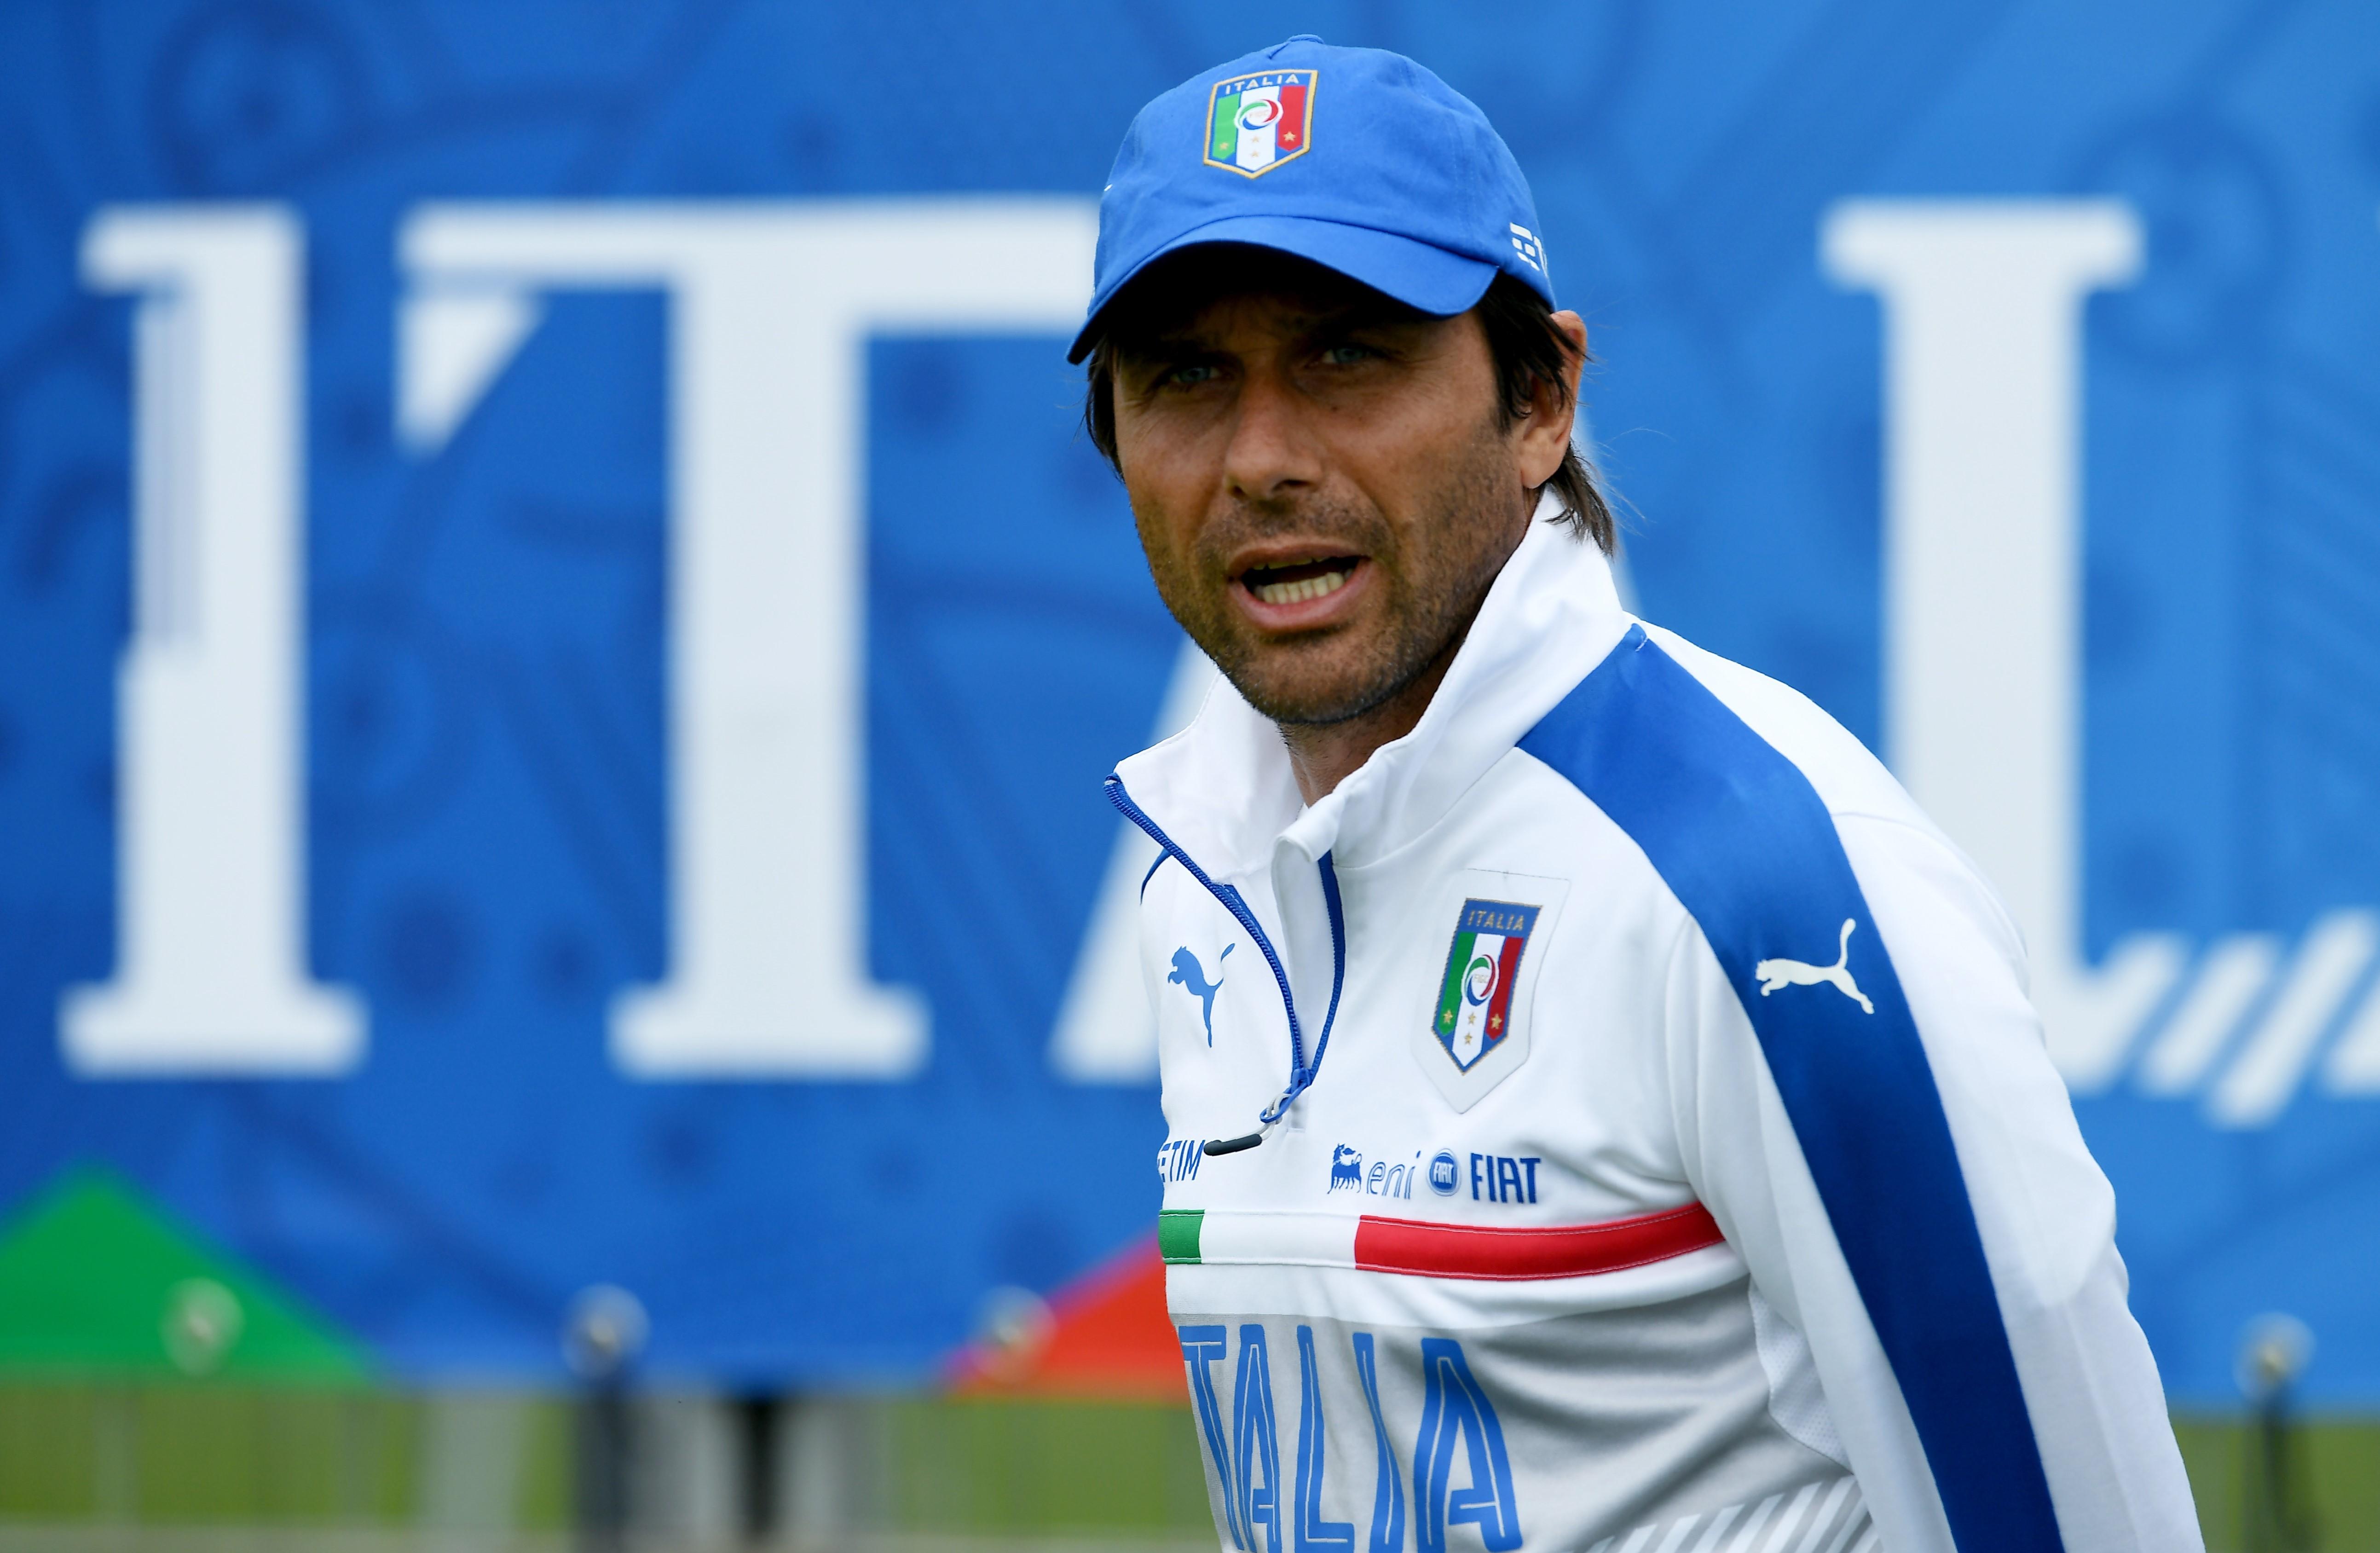 Antonio Conte à l'entrainement avec la Squadra Azzurra